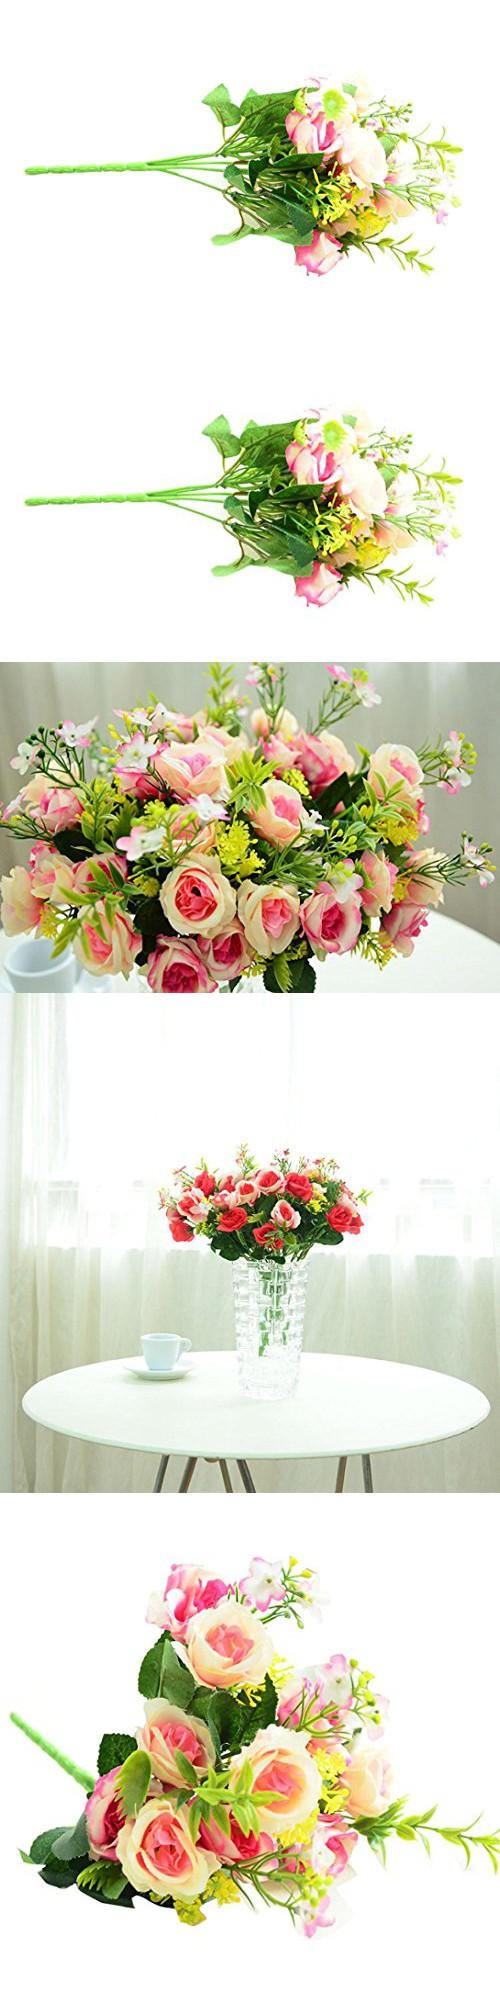 Ecosinartificial Silk Peony Flowers Home Garden Wedding Party